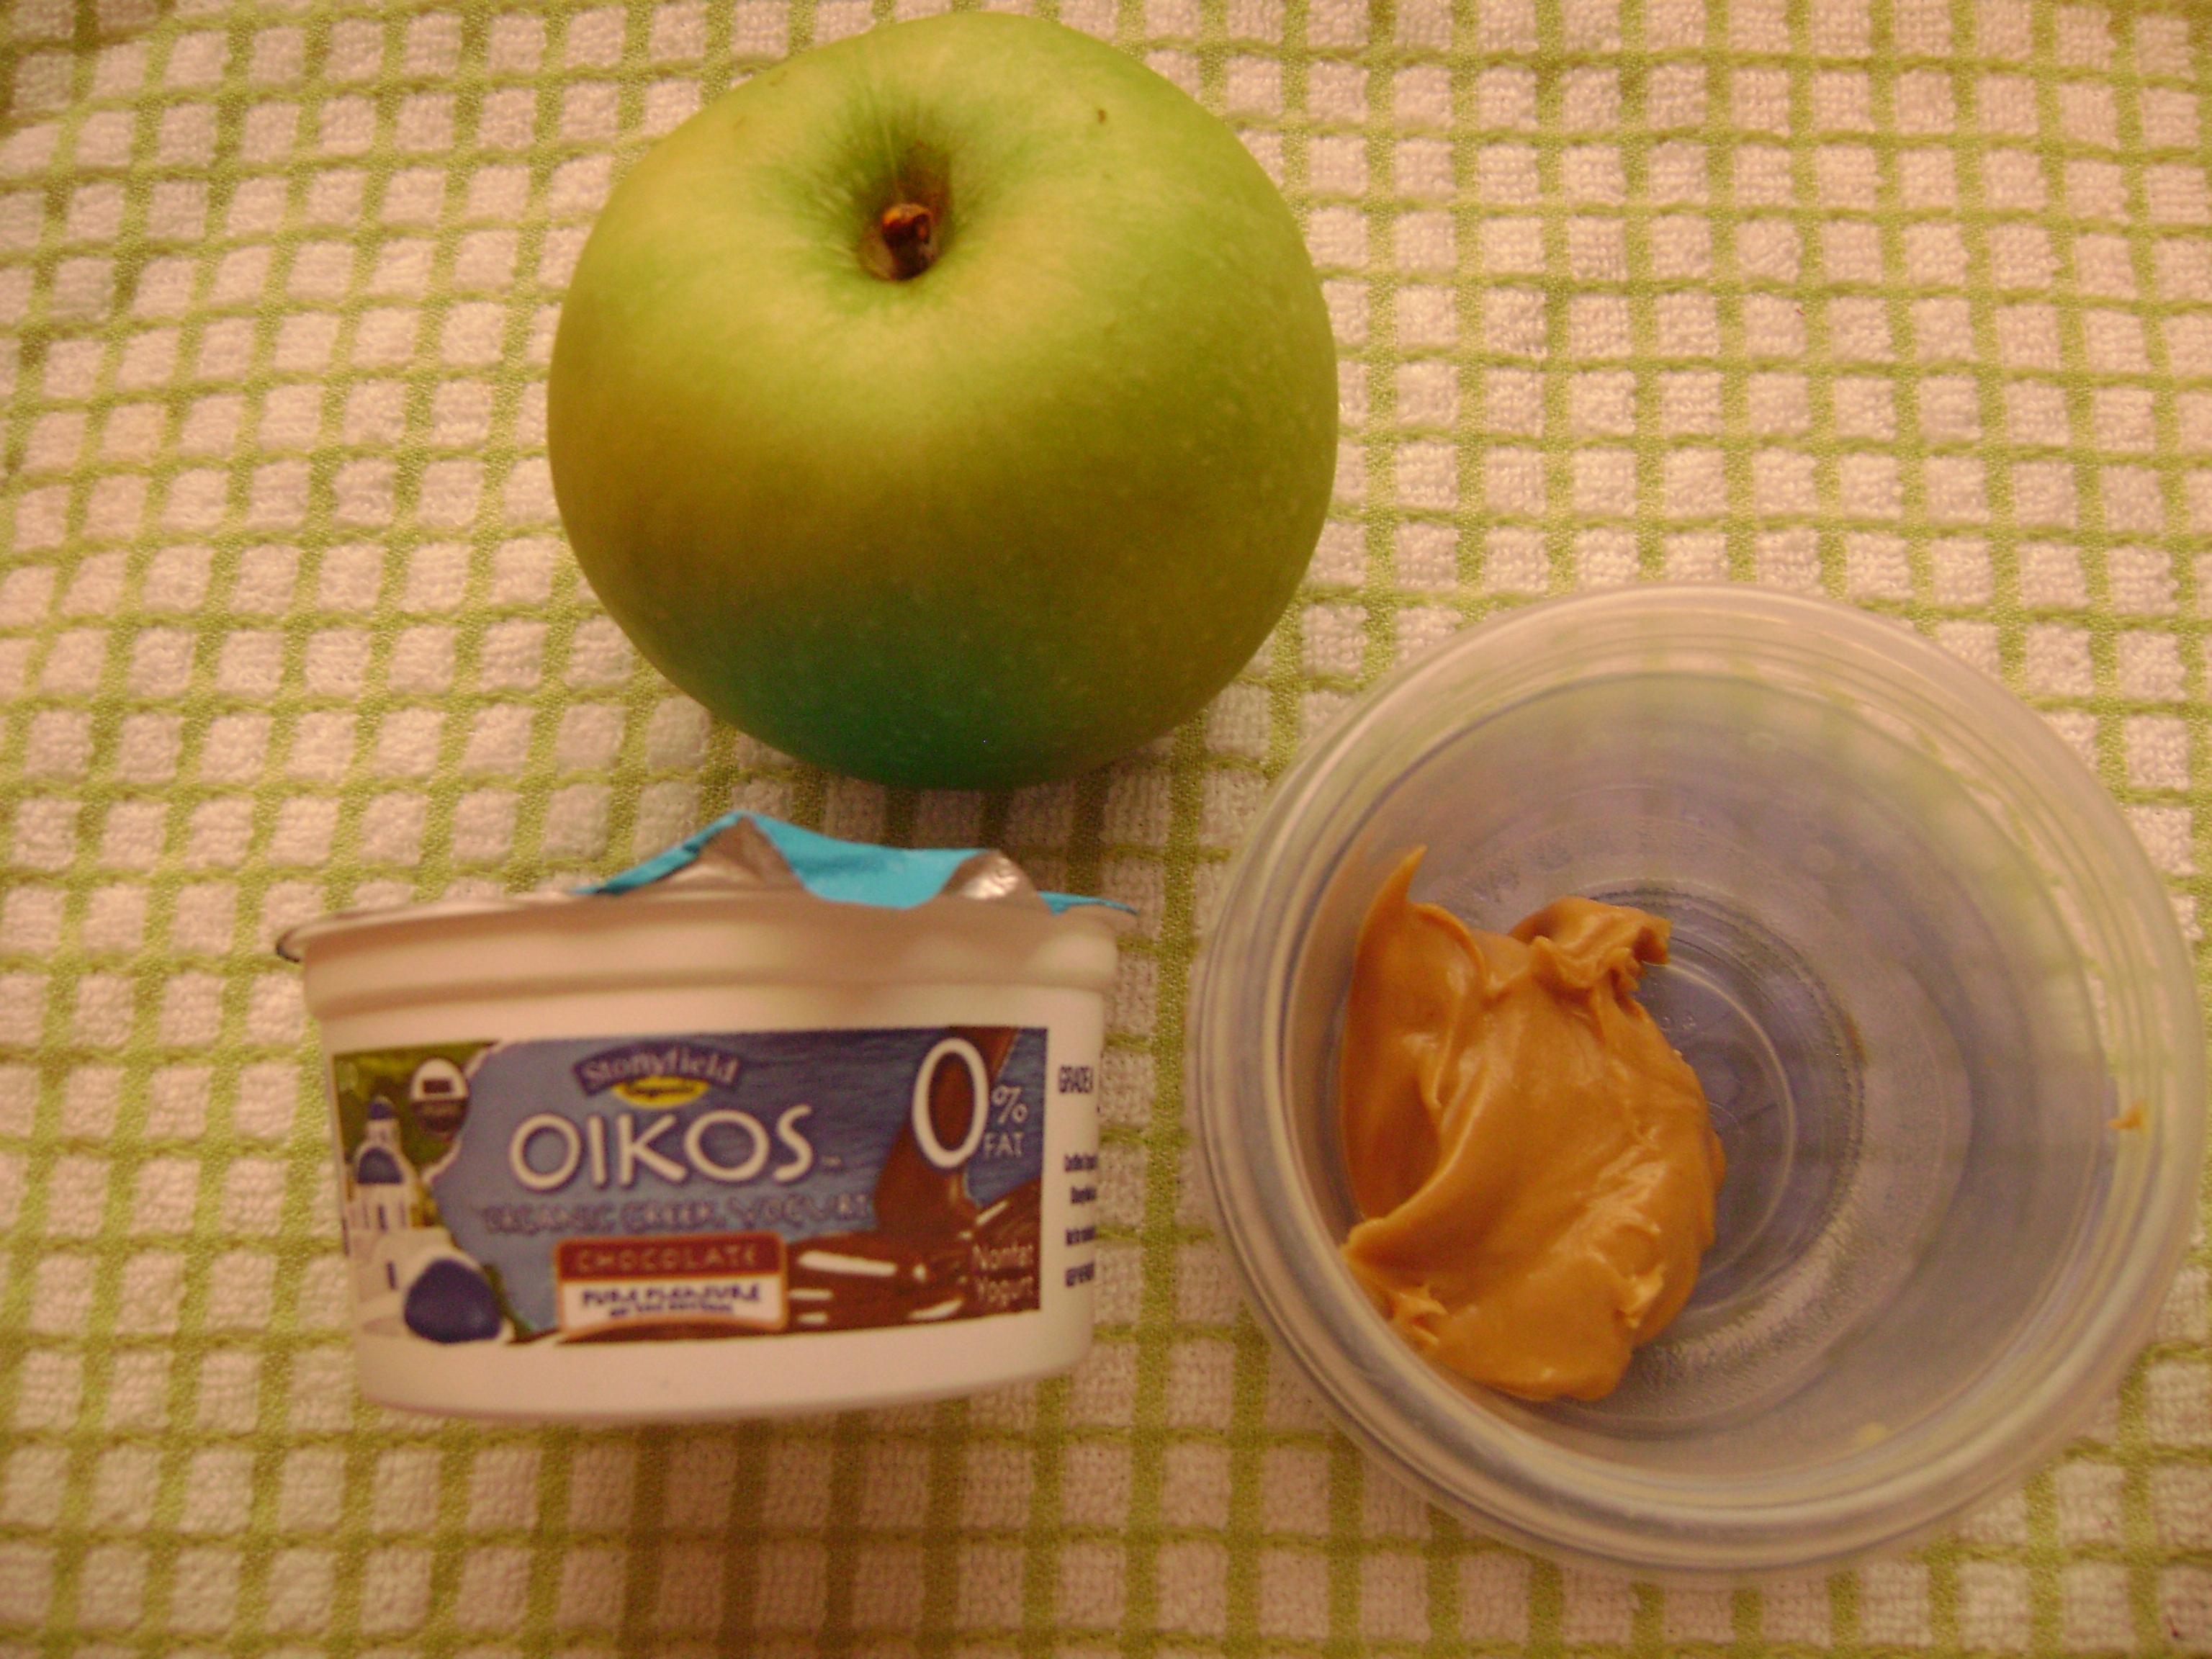 Can Dogs Eat Greek Yogurt With Fruit